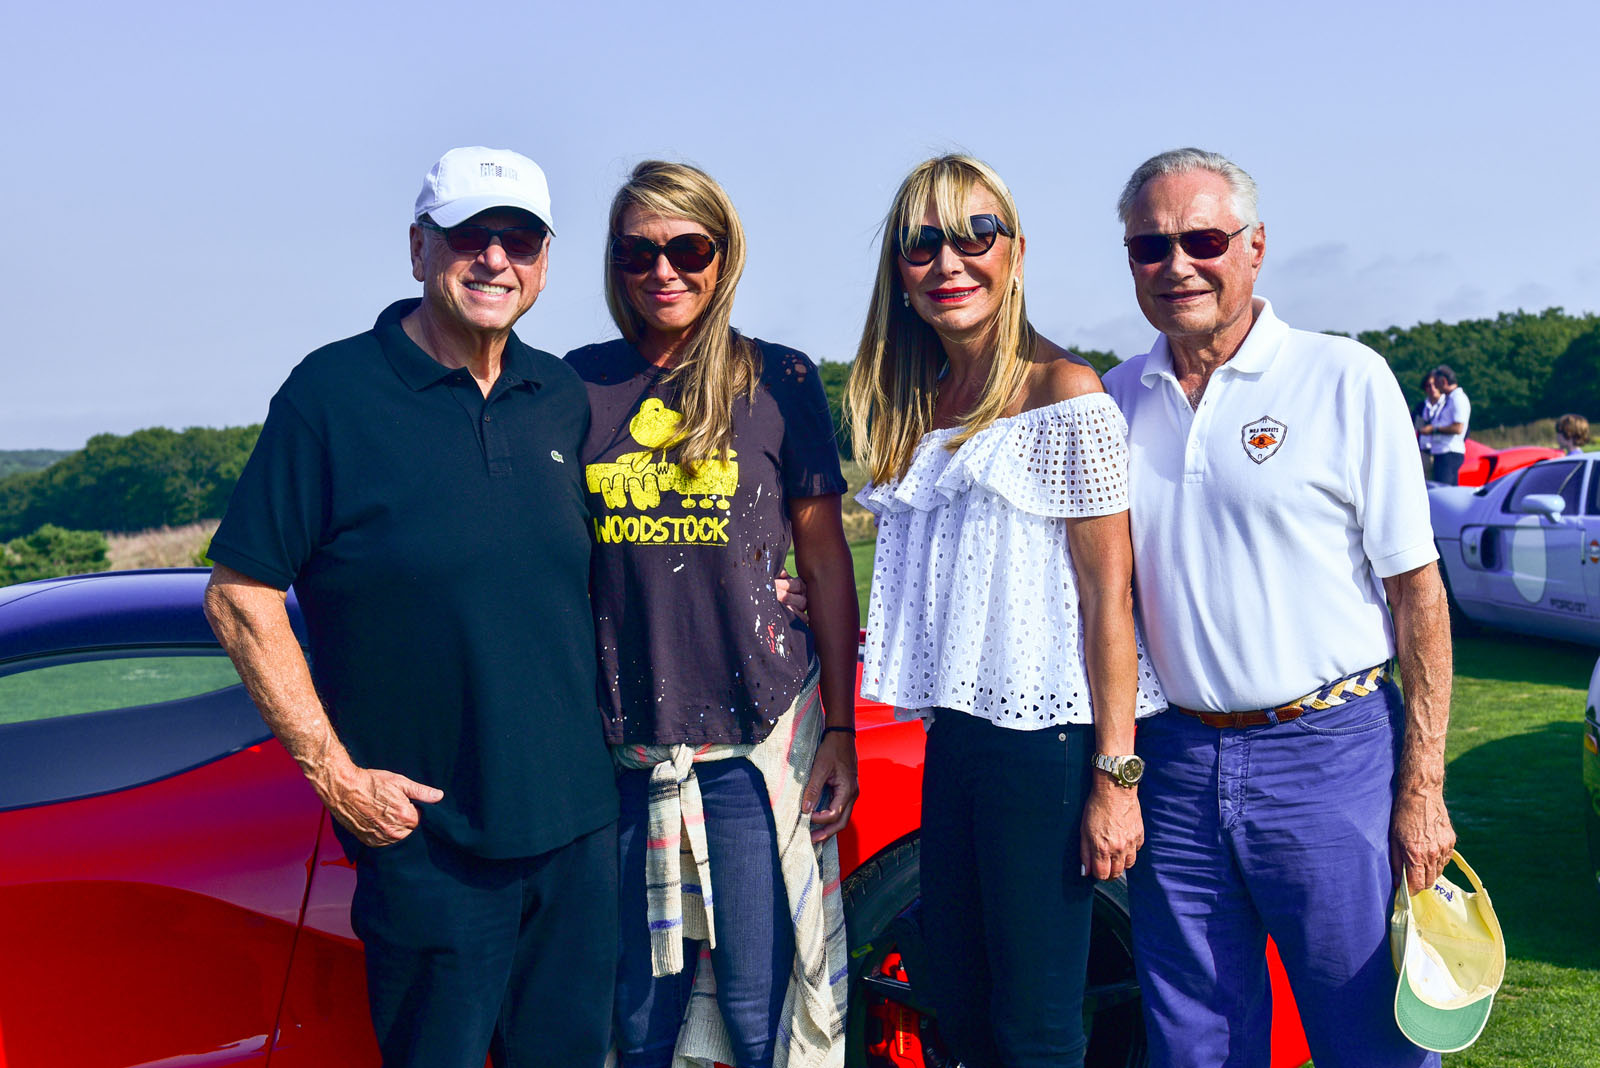 Howard Lorber, Susan Bordeau, Claudia Walters, Billy Walters / The Bridge 2017 / Former Bridgehampton Race Circuit, Bridgehampton, NY / September 16, 2017 / ©Patrick McMullan / Photo - Sean Zanni / PMC